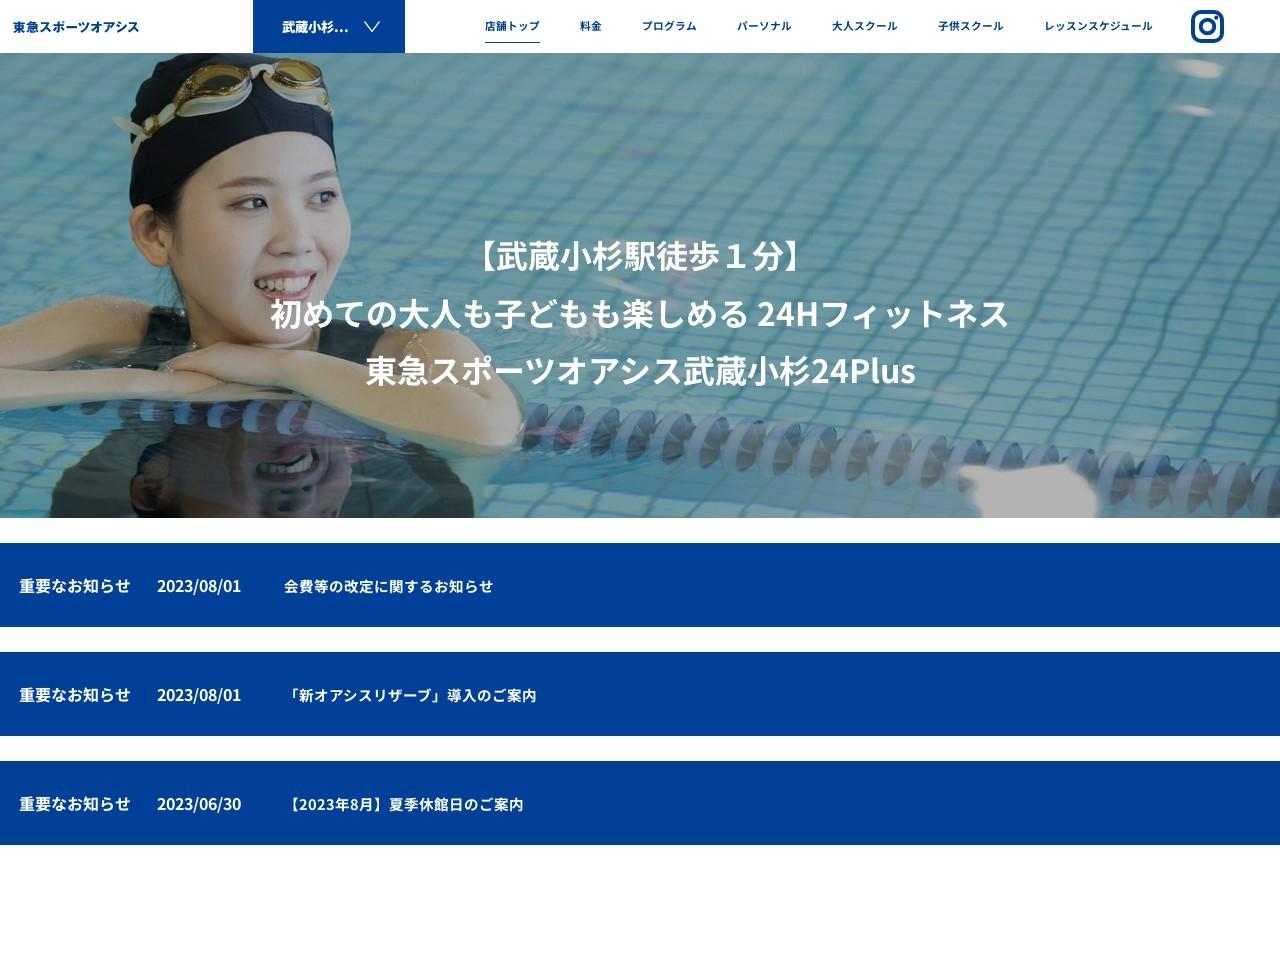 Oasis武蔵小杉24Plusのイメージ写真